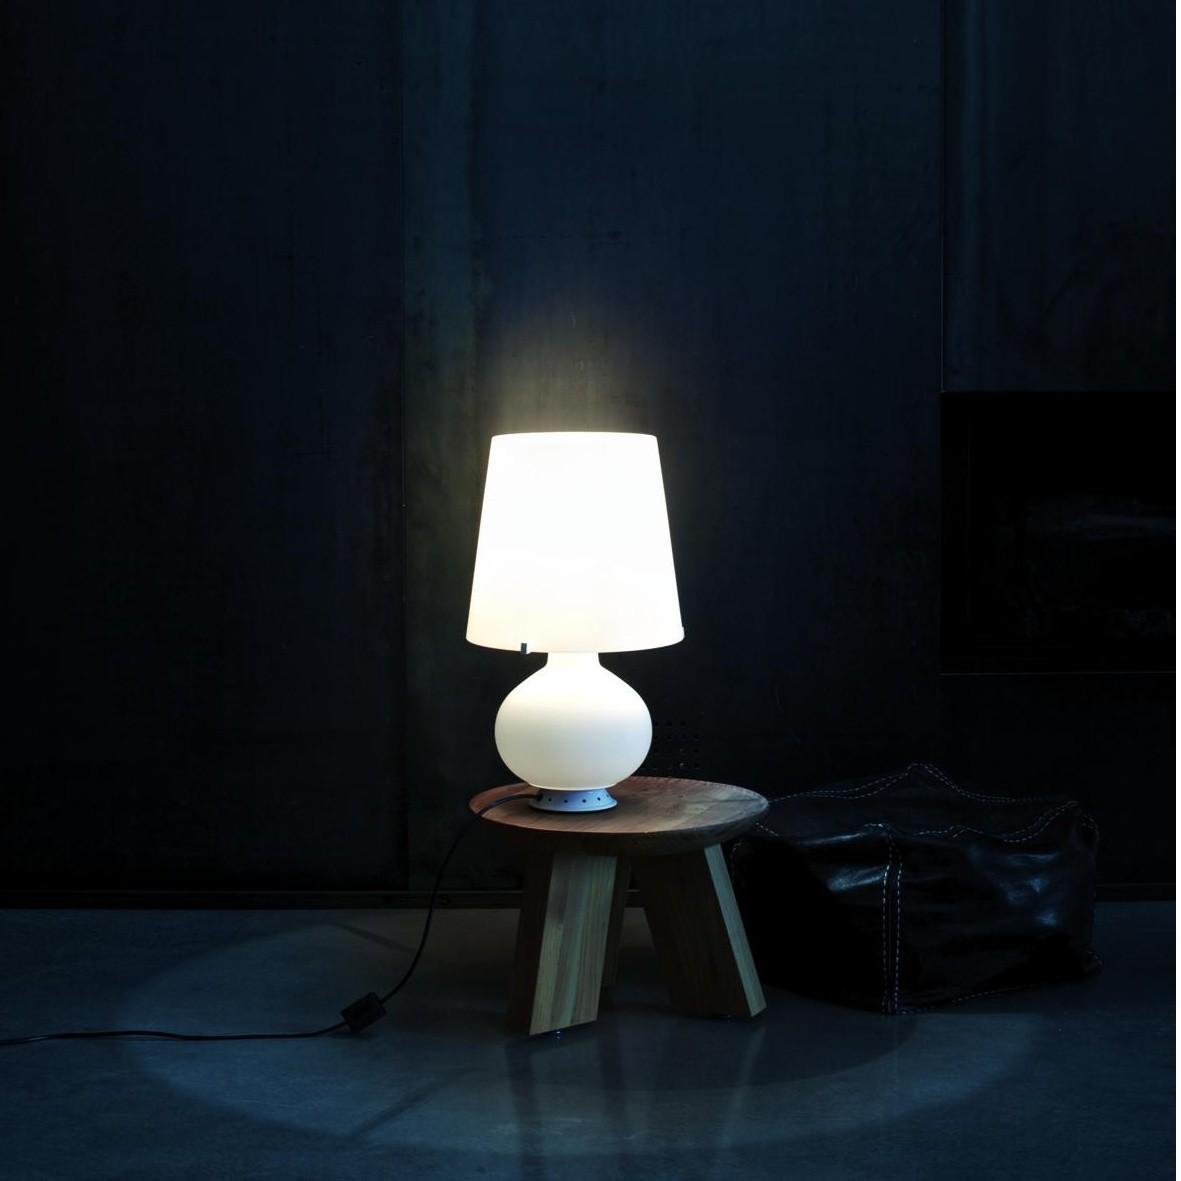 fontana 1853 medium lampe de table fontana arte. Black Bedroom Furniture Sets. Home Design Ideas